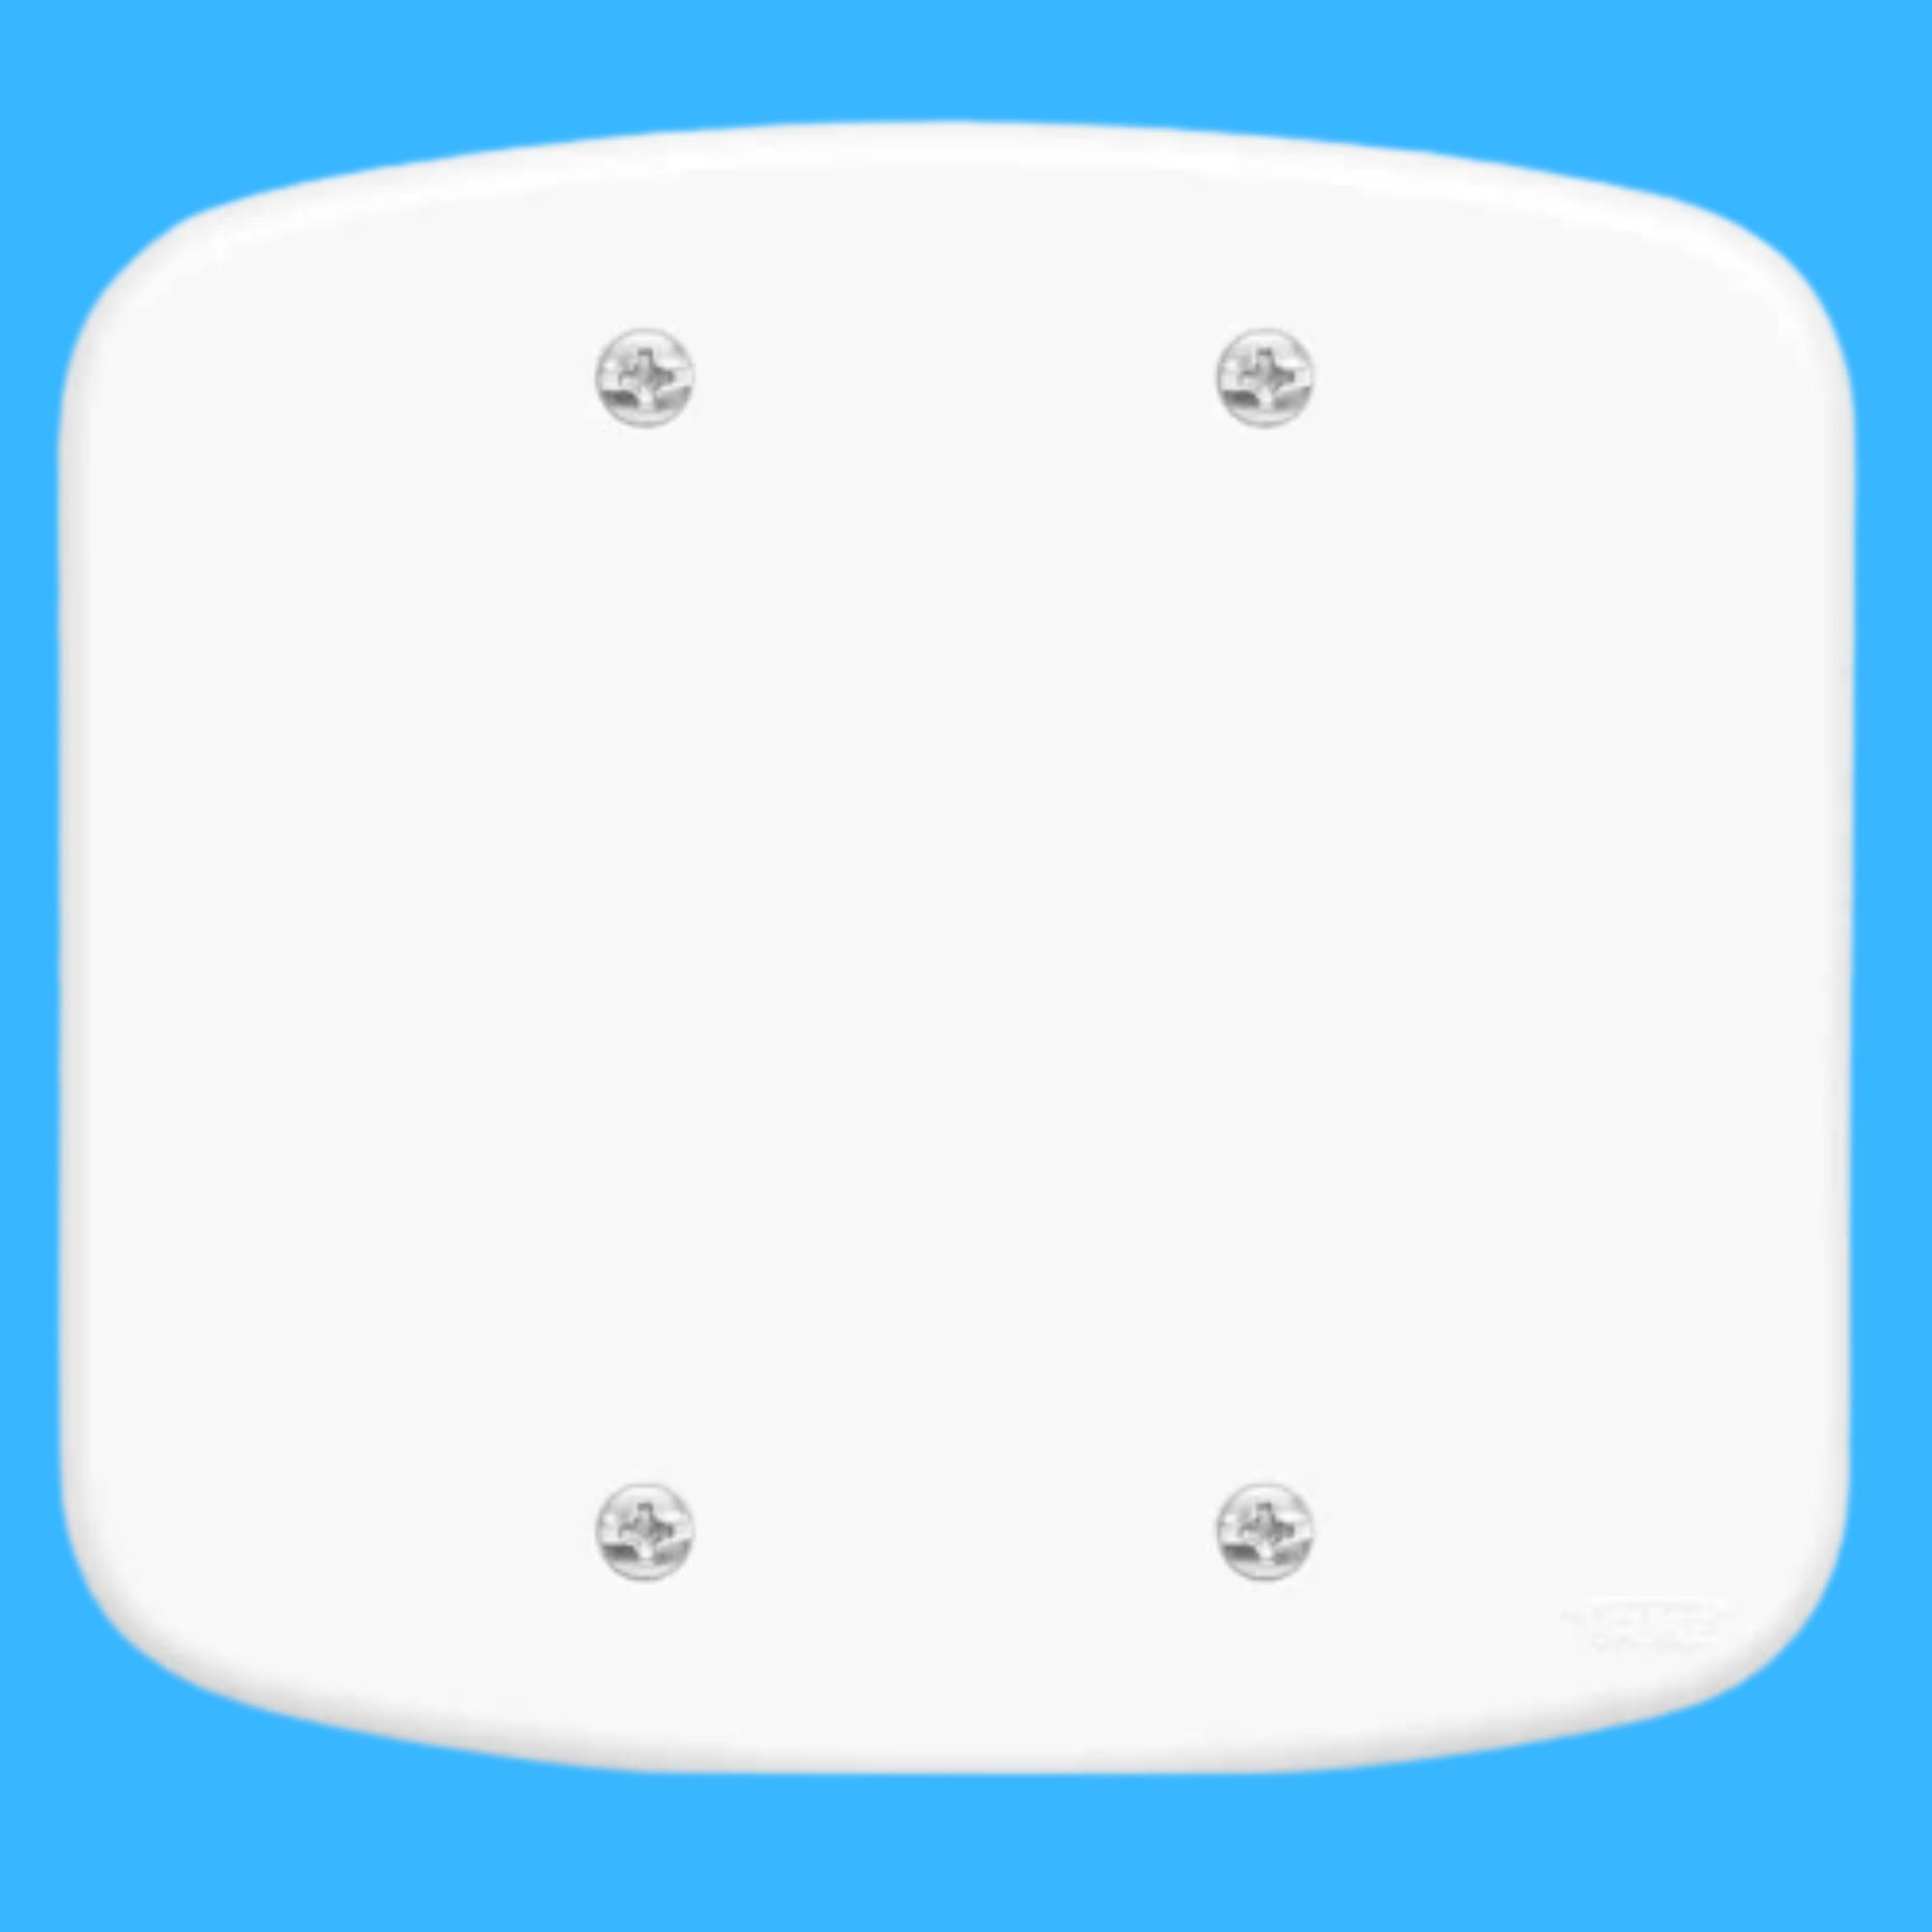 Blanc Placa 4x4 Cega